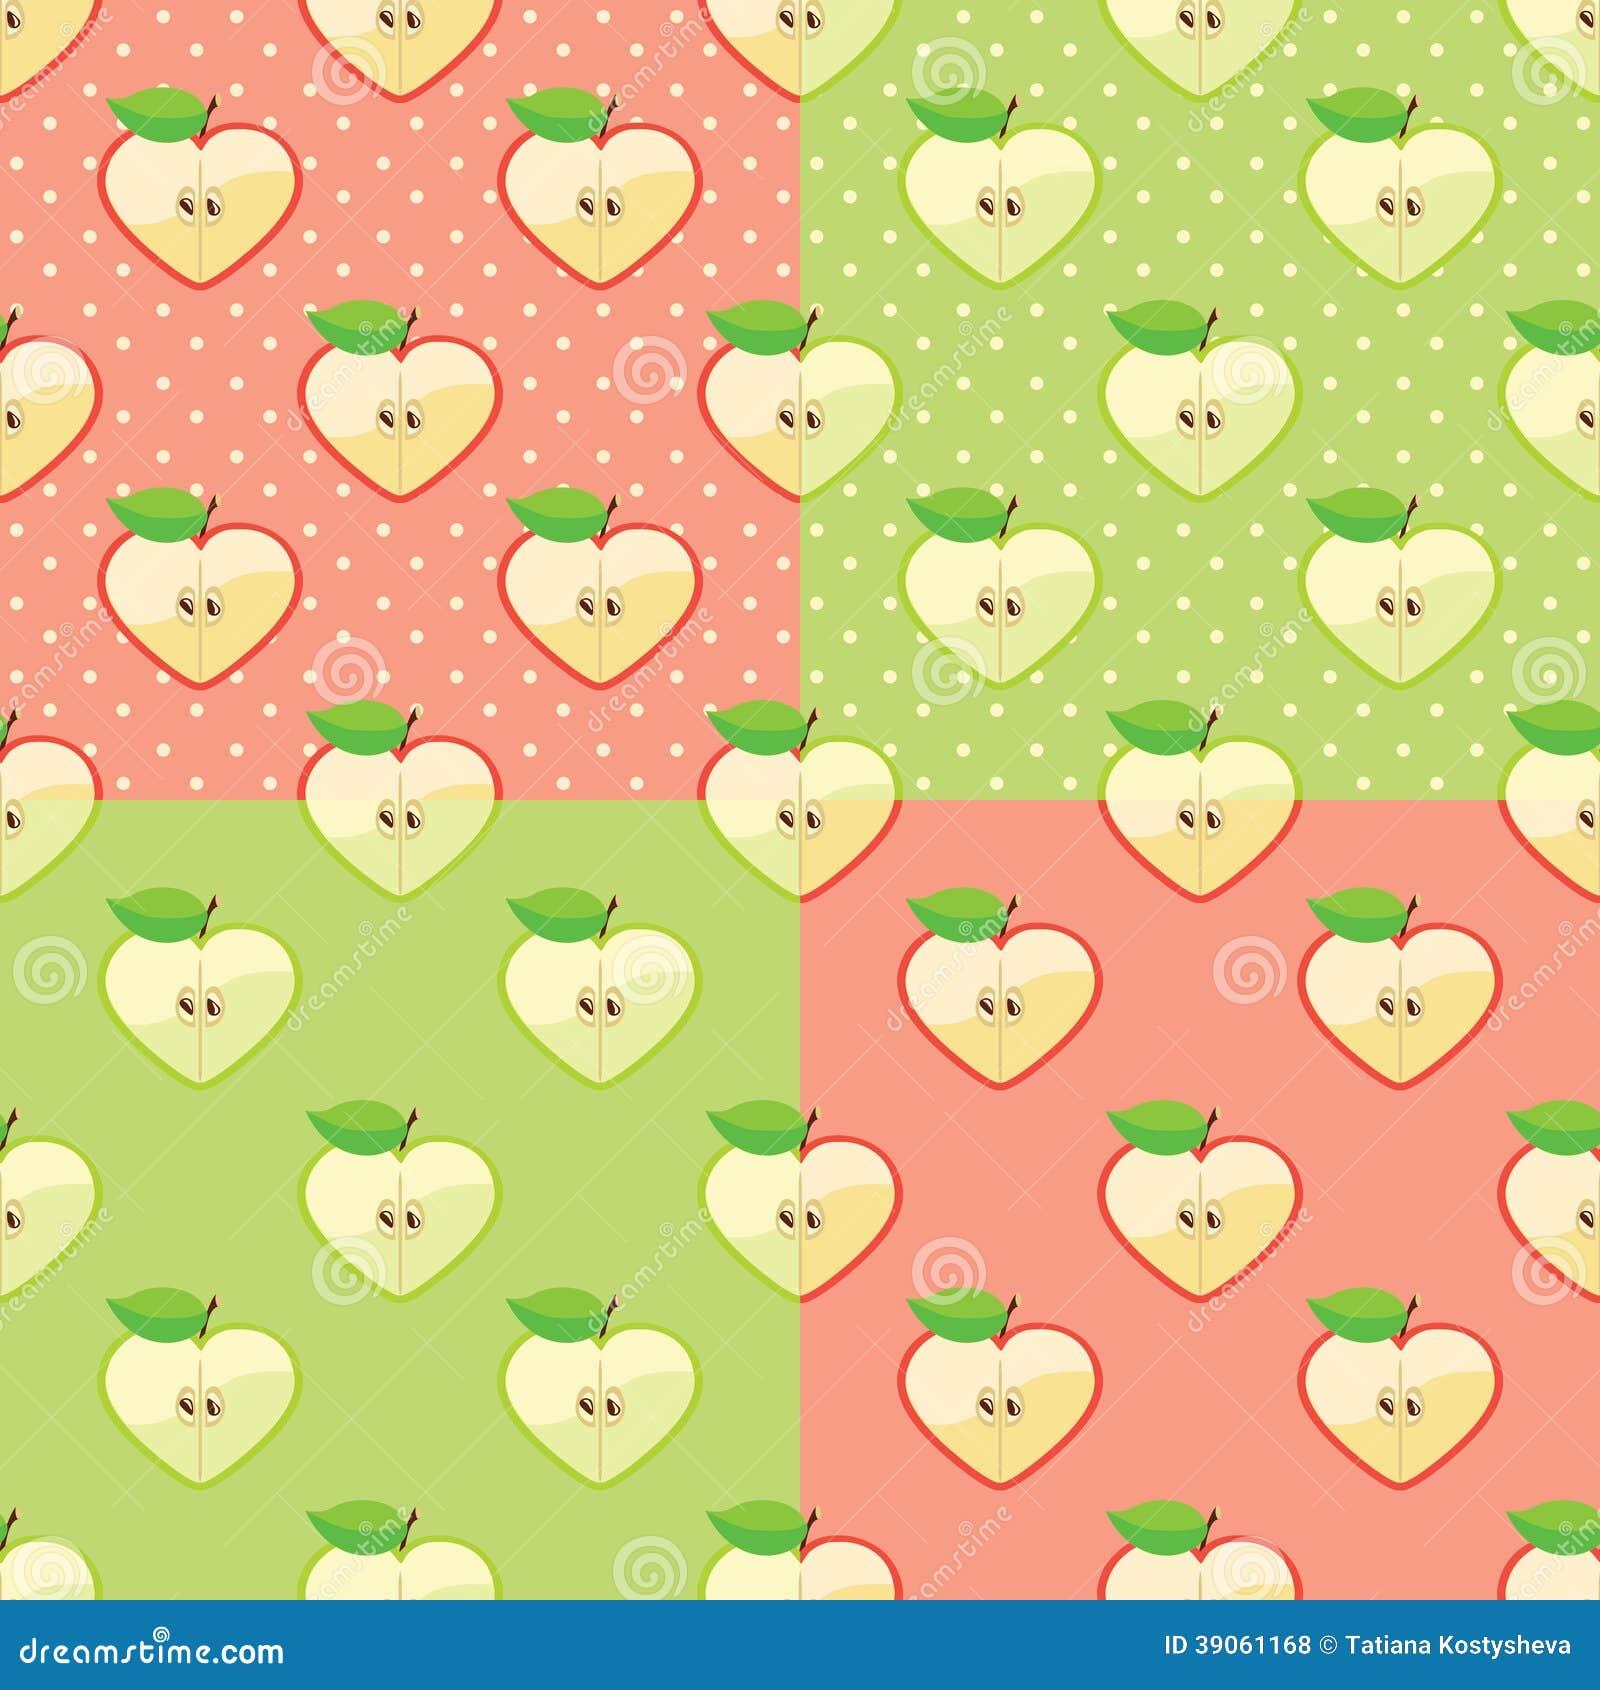 apples wallpaper free download